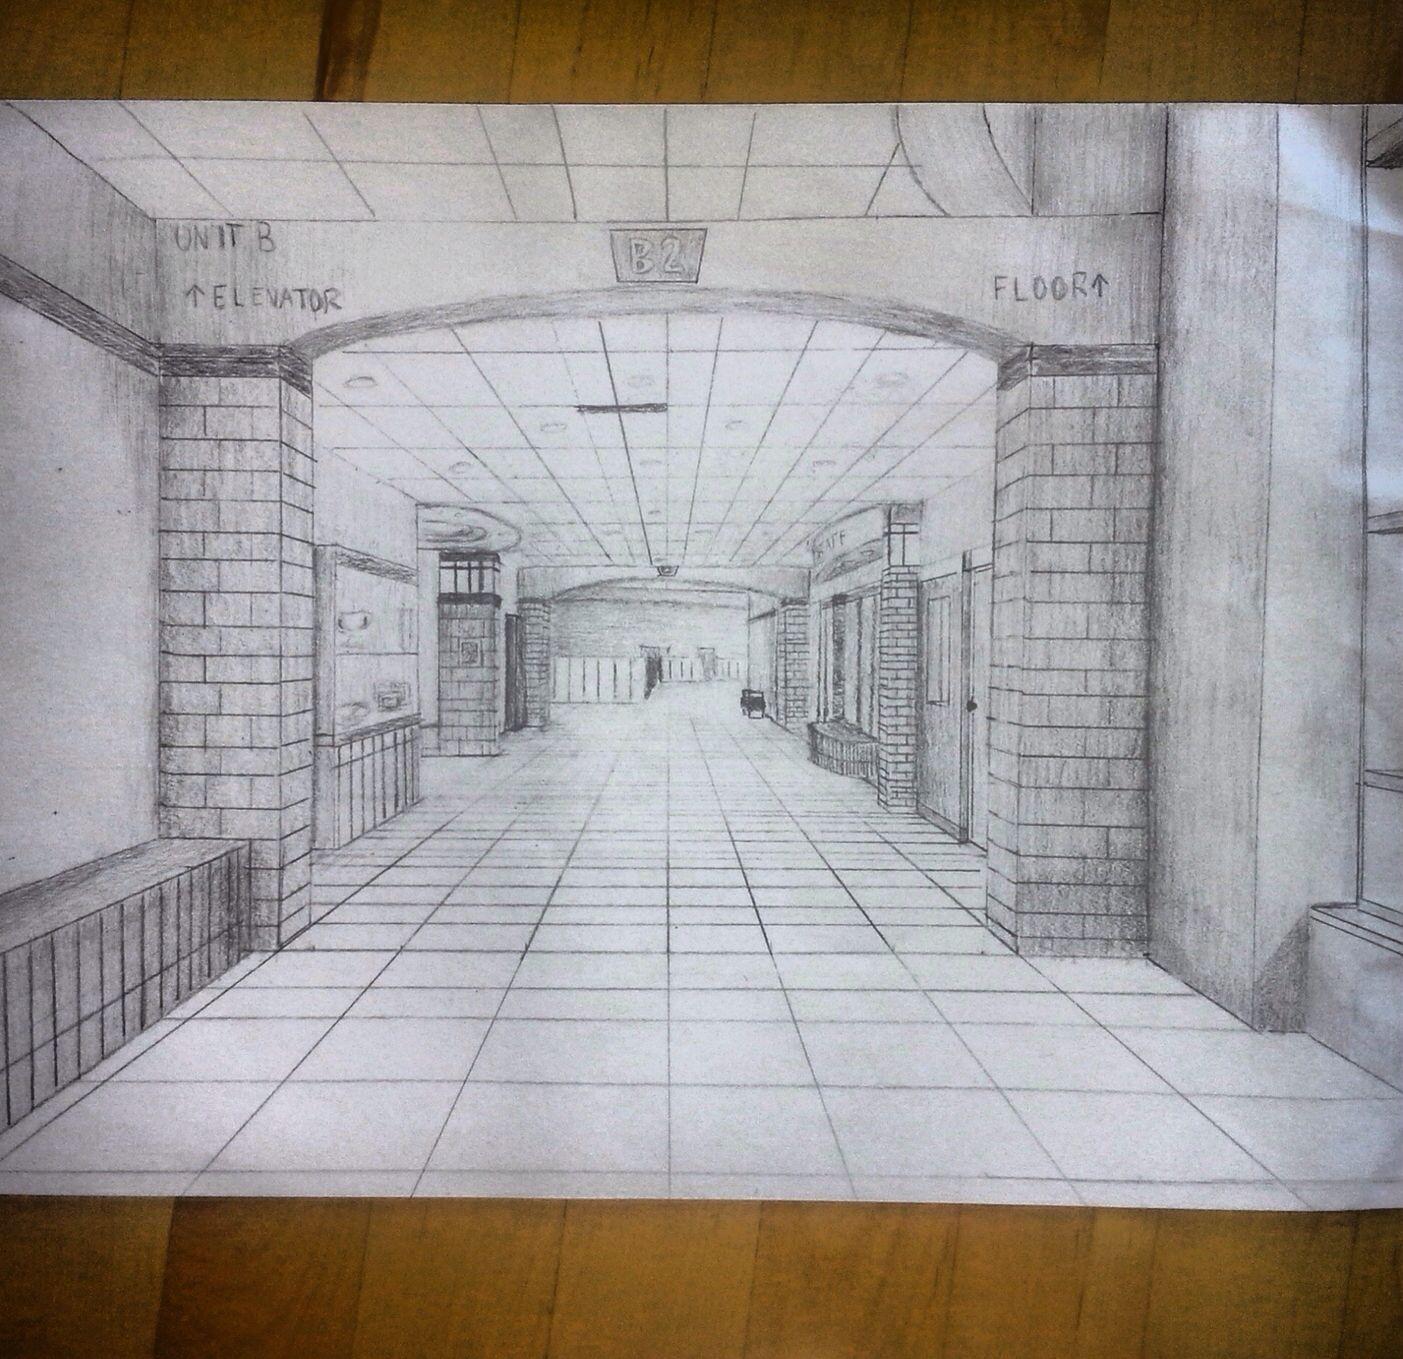 One-point Perspective Hallway That I Drew